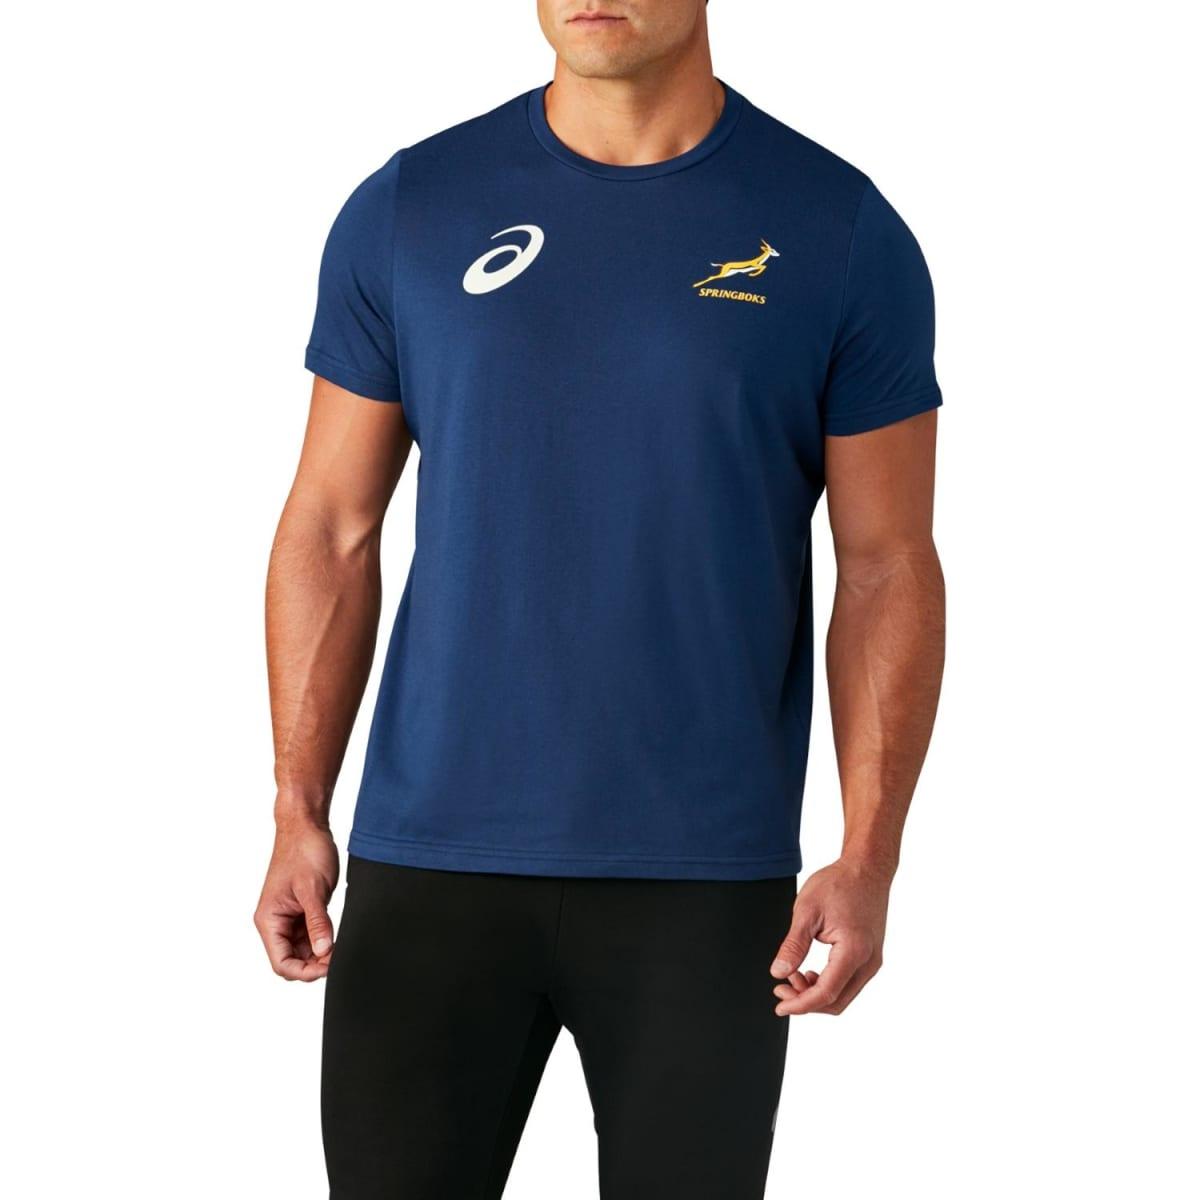 929c4d93 Rugby | Senior Jerseys | Sportsmans Warehouse